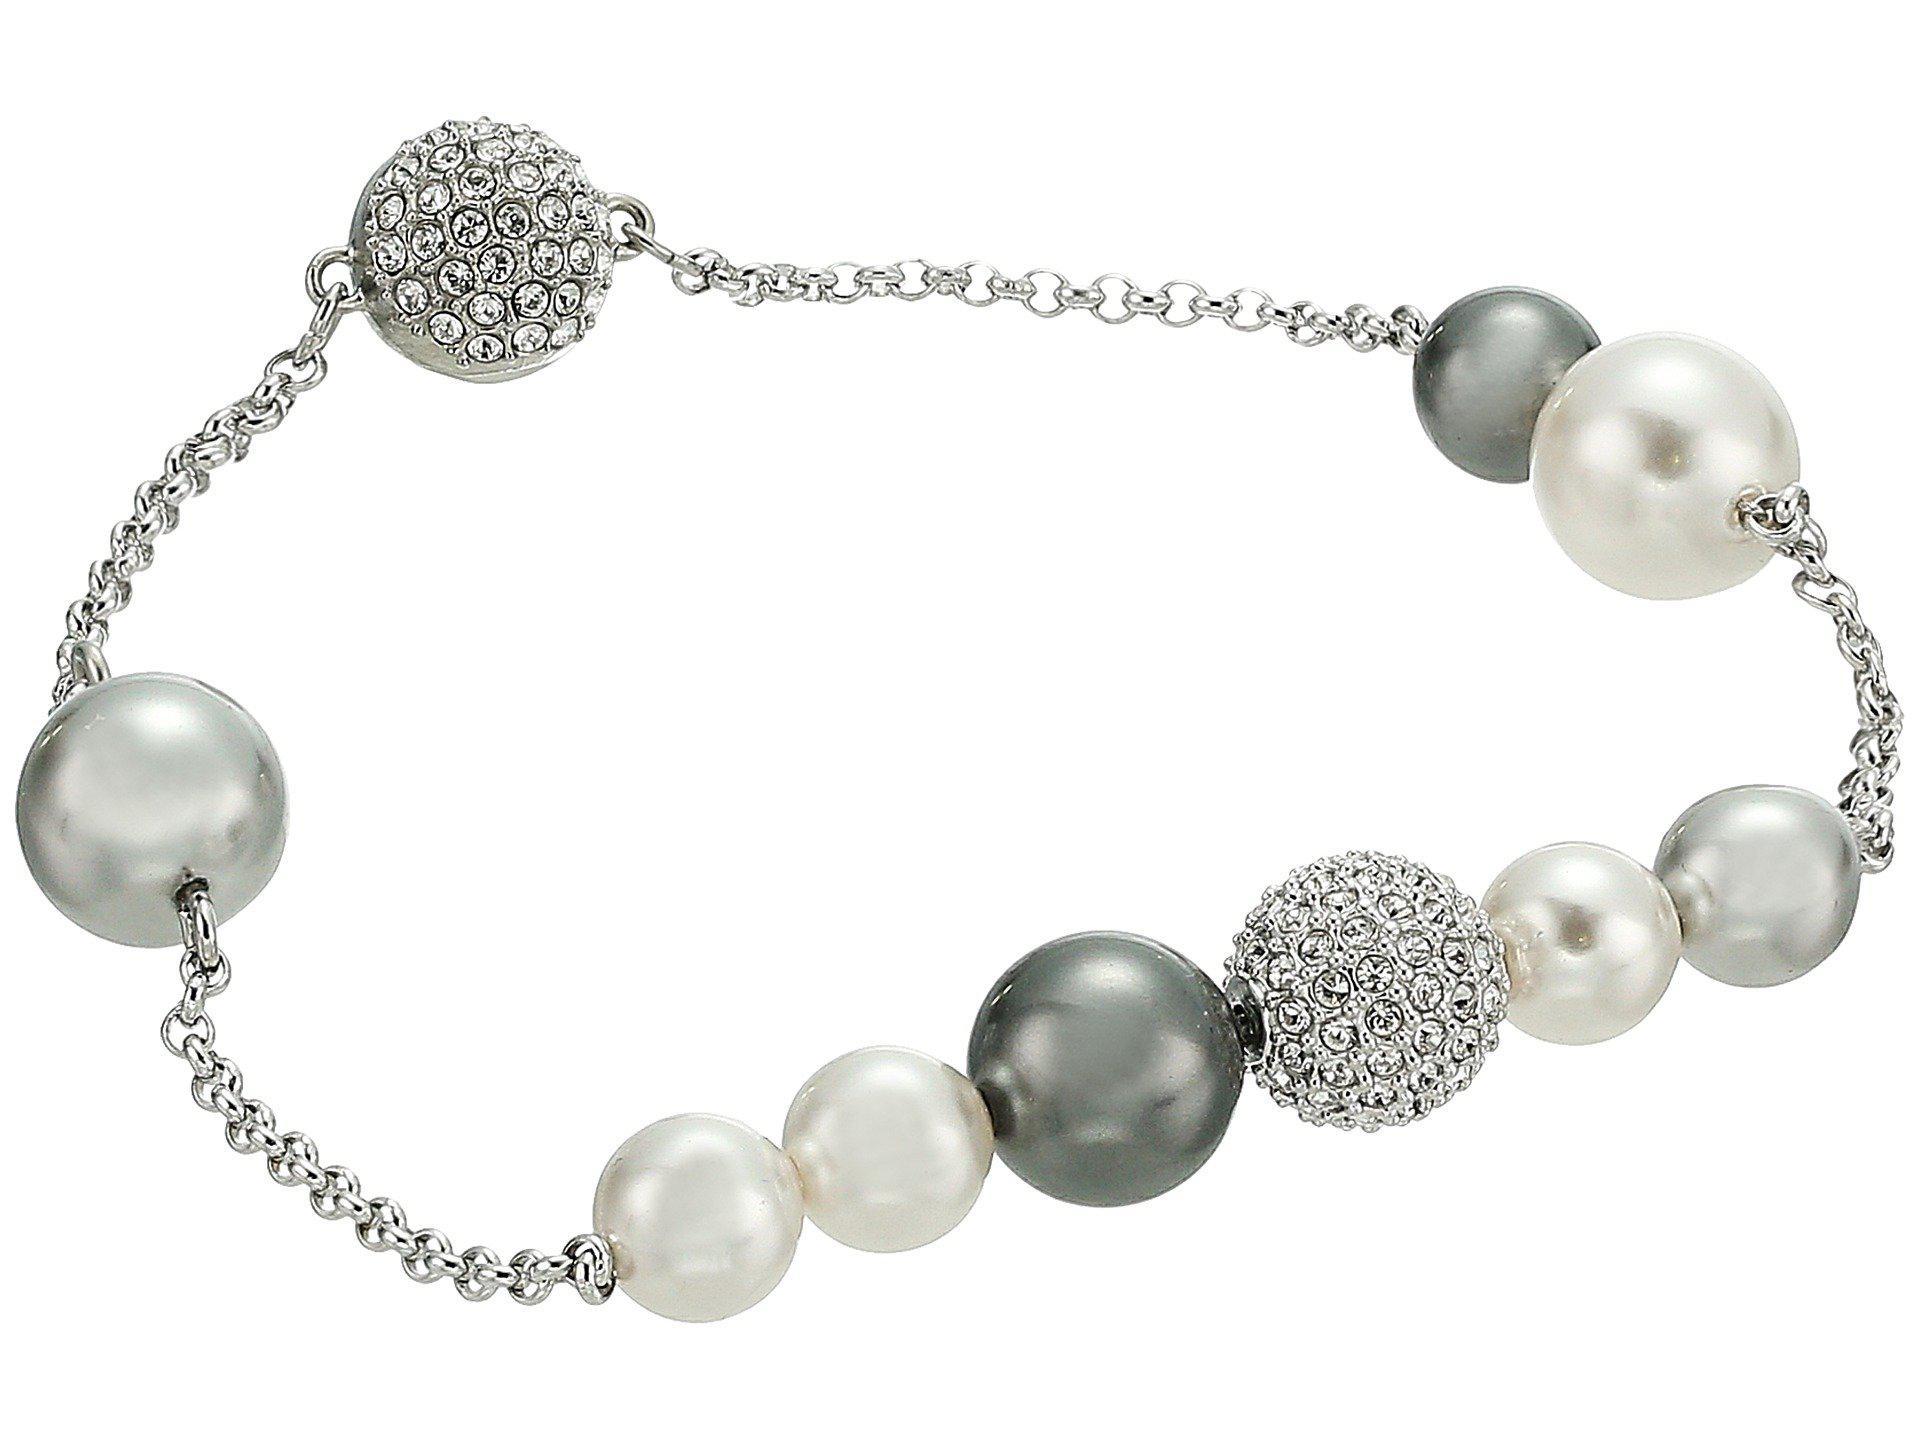 Lyst - Swarovski Remix Collection Mixed Gray Crystal Pearl Bracelet ... e4a0ba99efa2